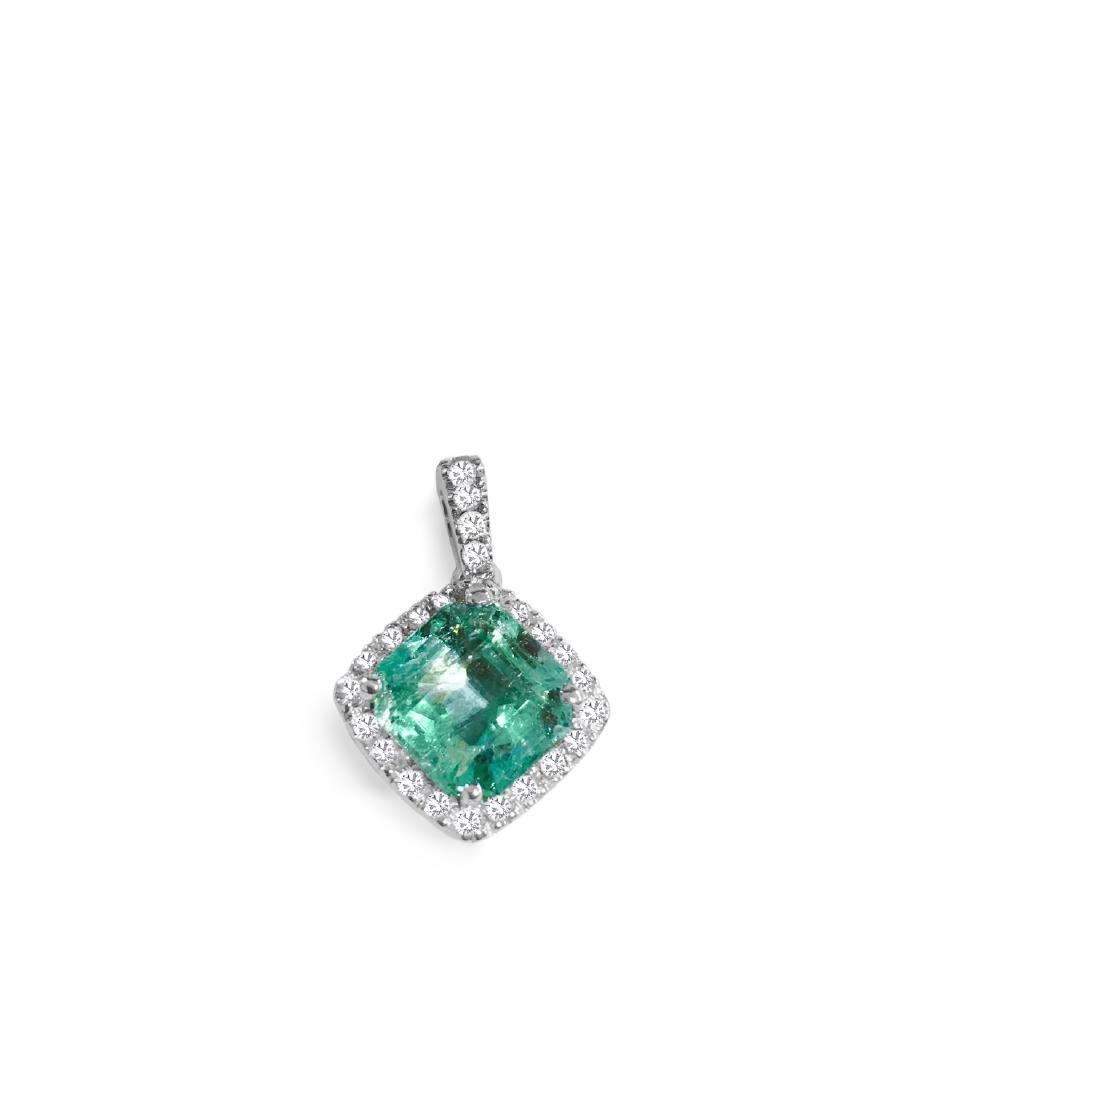 14k Gold, 4.00 Carat Emerald & Diamond Pendant. $12,000